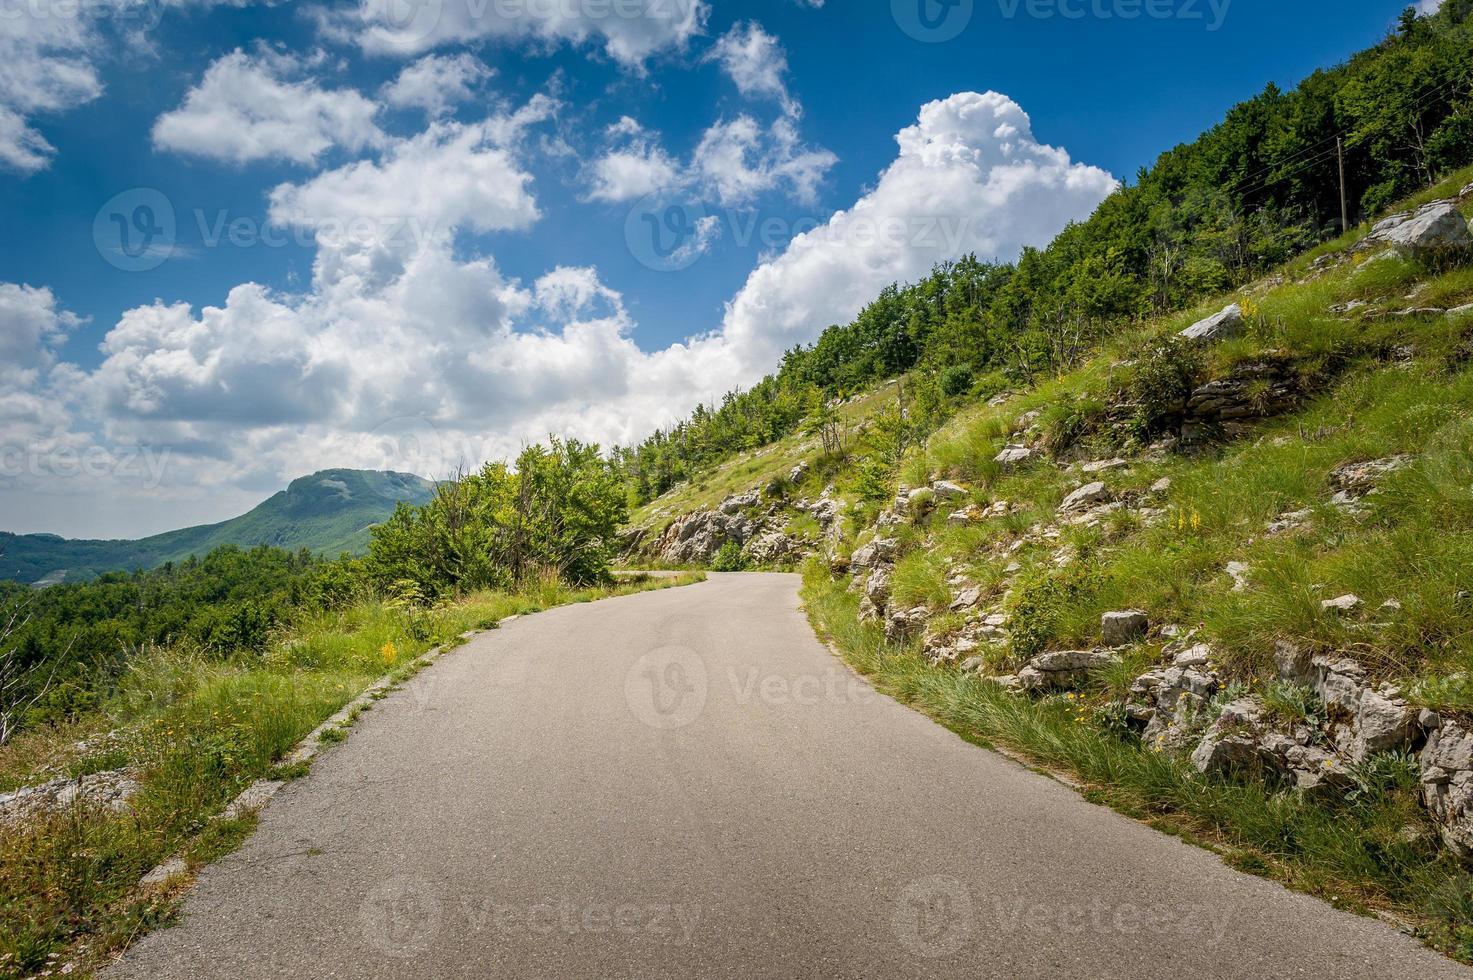 aventura na estrada da montanha foto